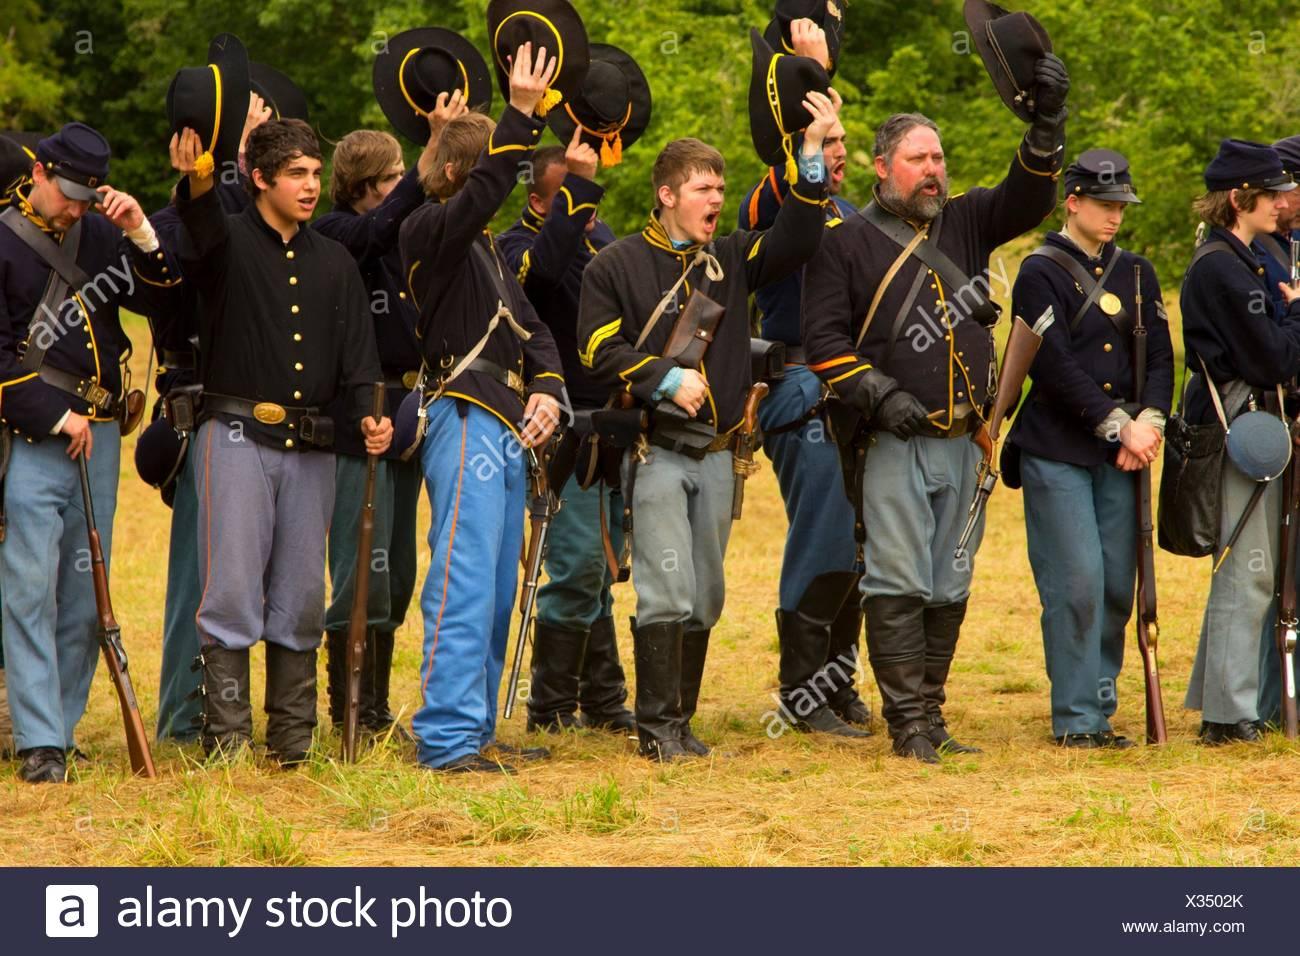 Union soldiers, Civil War Reenactment, Willamette Mission State Park, Oregon. - Stock Image